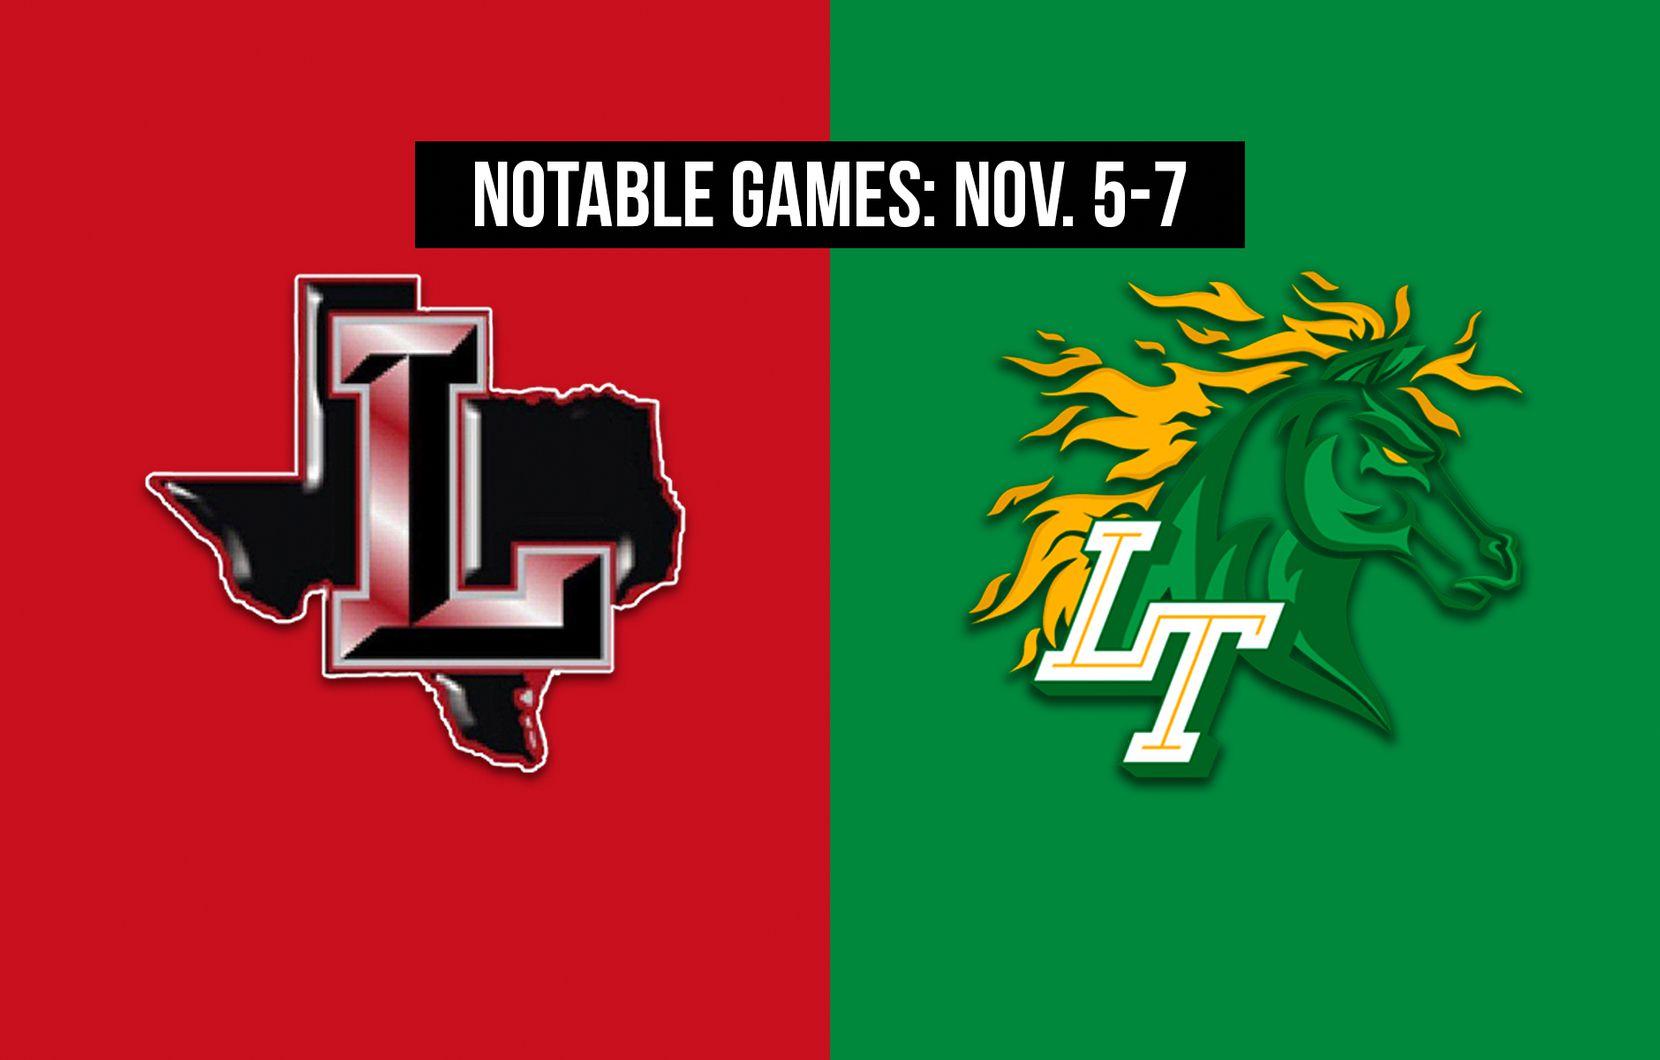 Notable games for the week of Nov. 5-7 of the 2020 season: Frisco Liberty vs. Frisco Lebanon Trail.